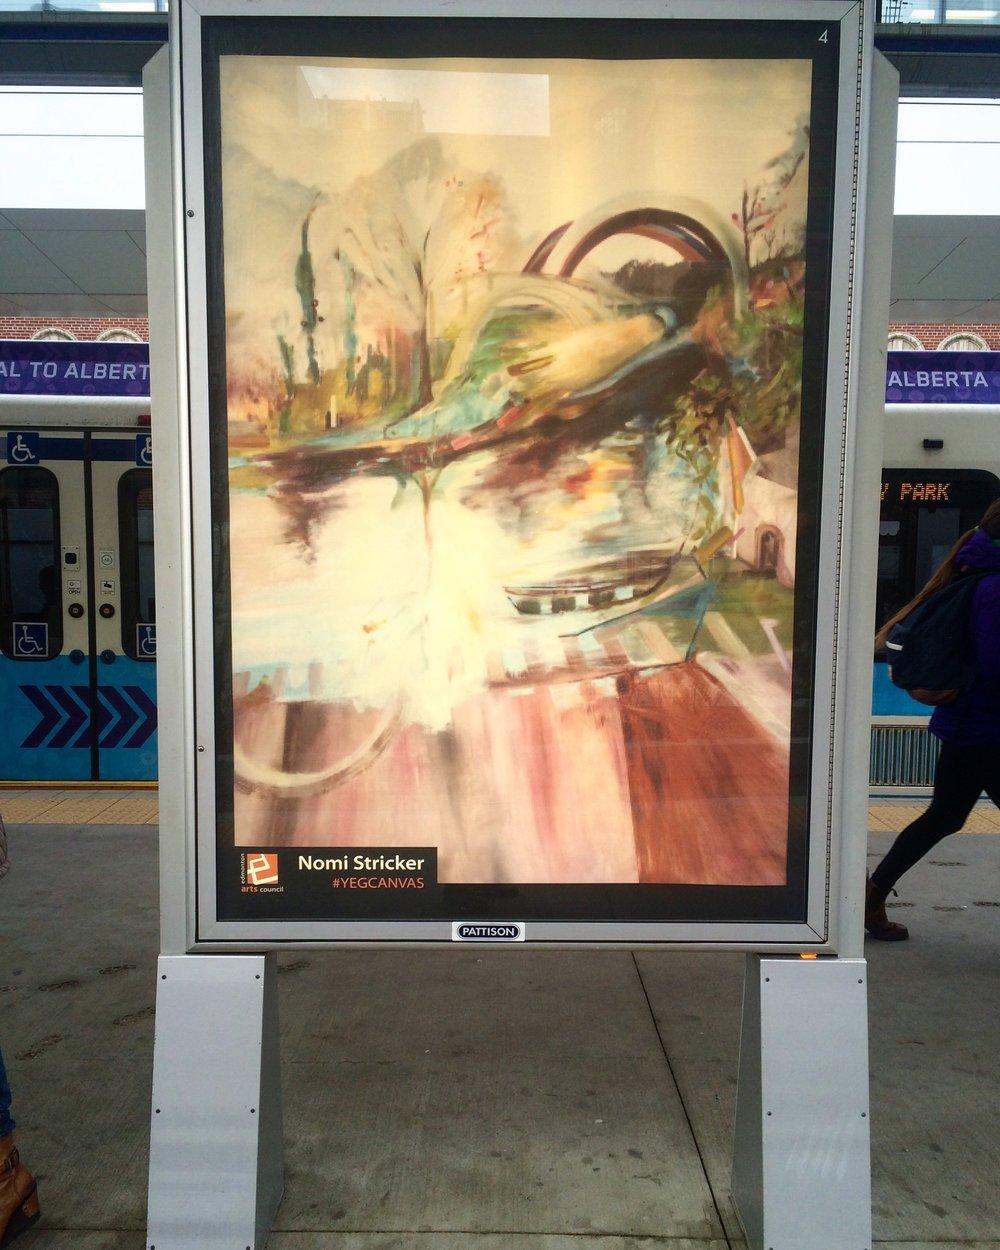 #YEGCanvas transit poster